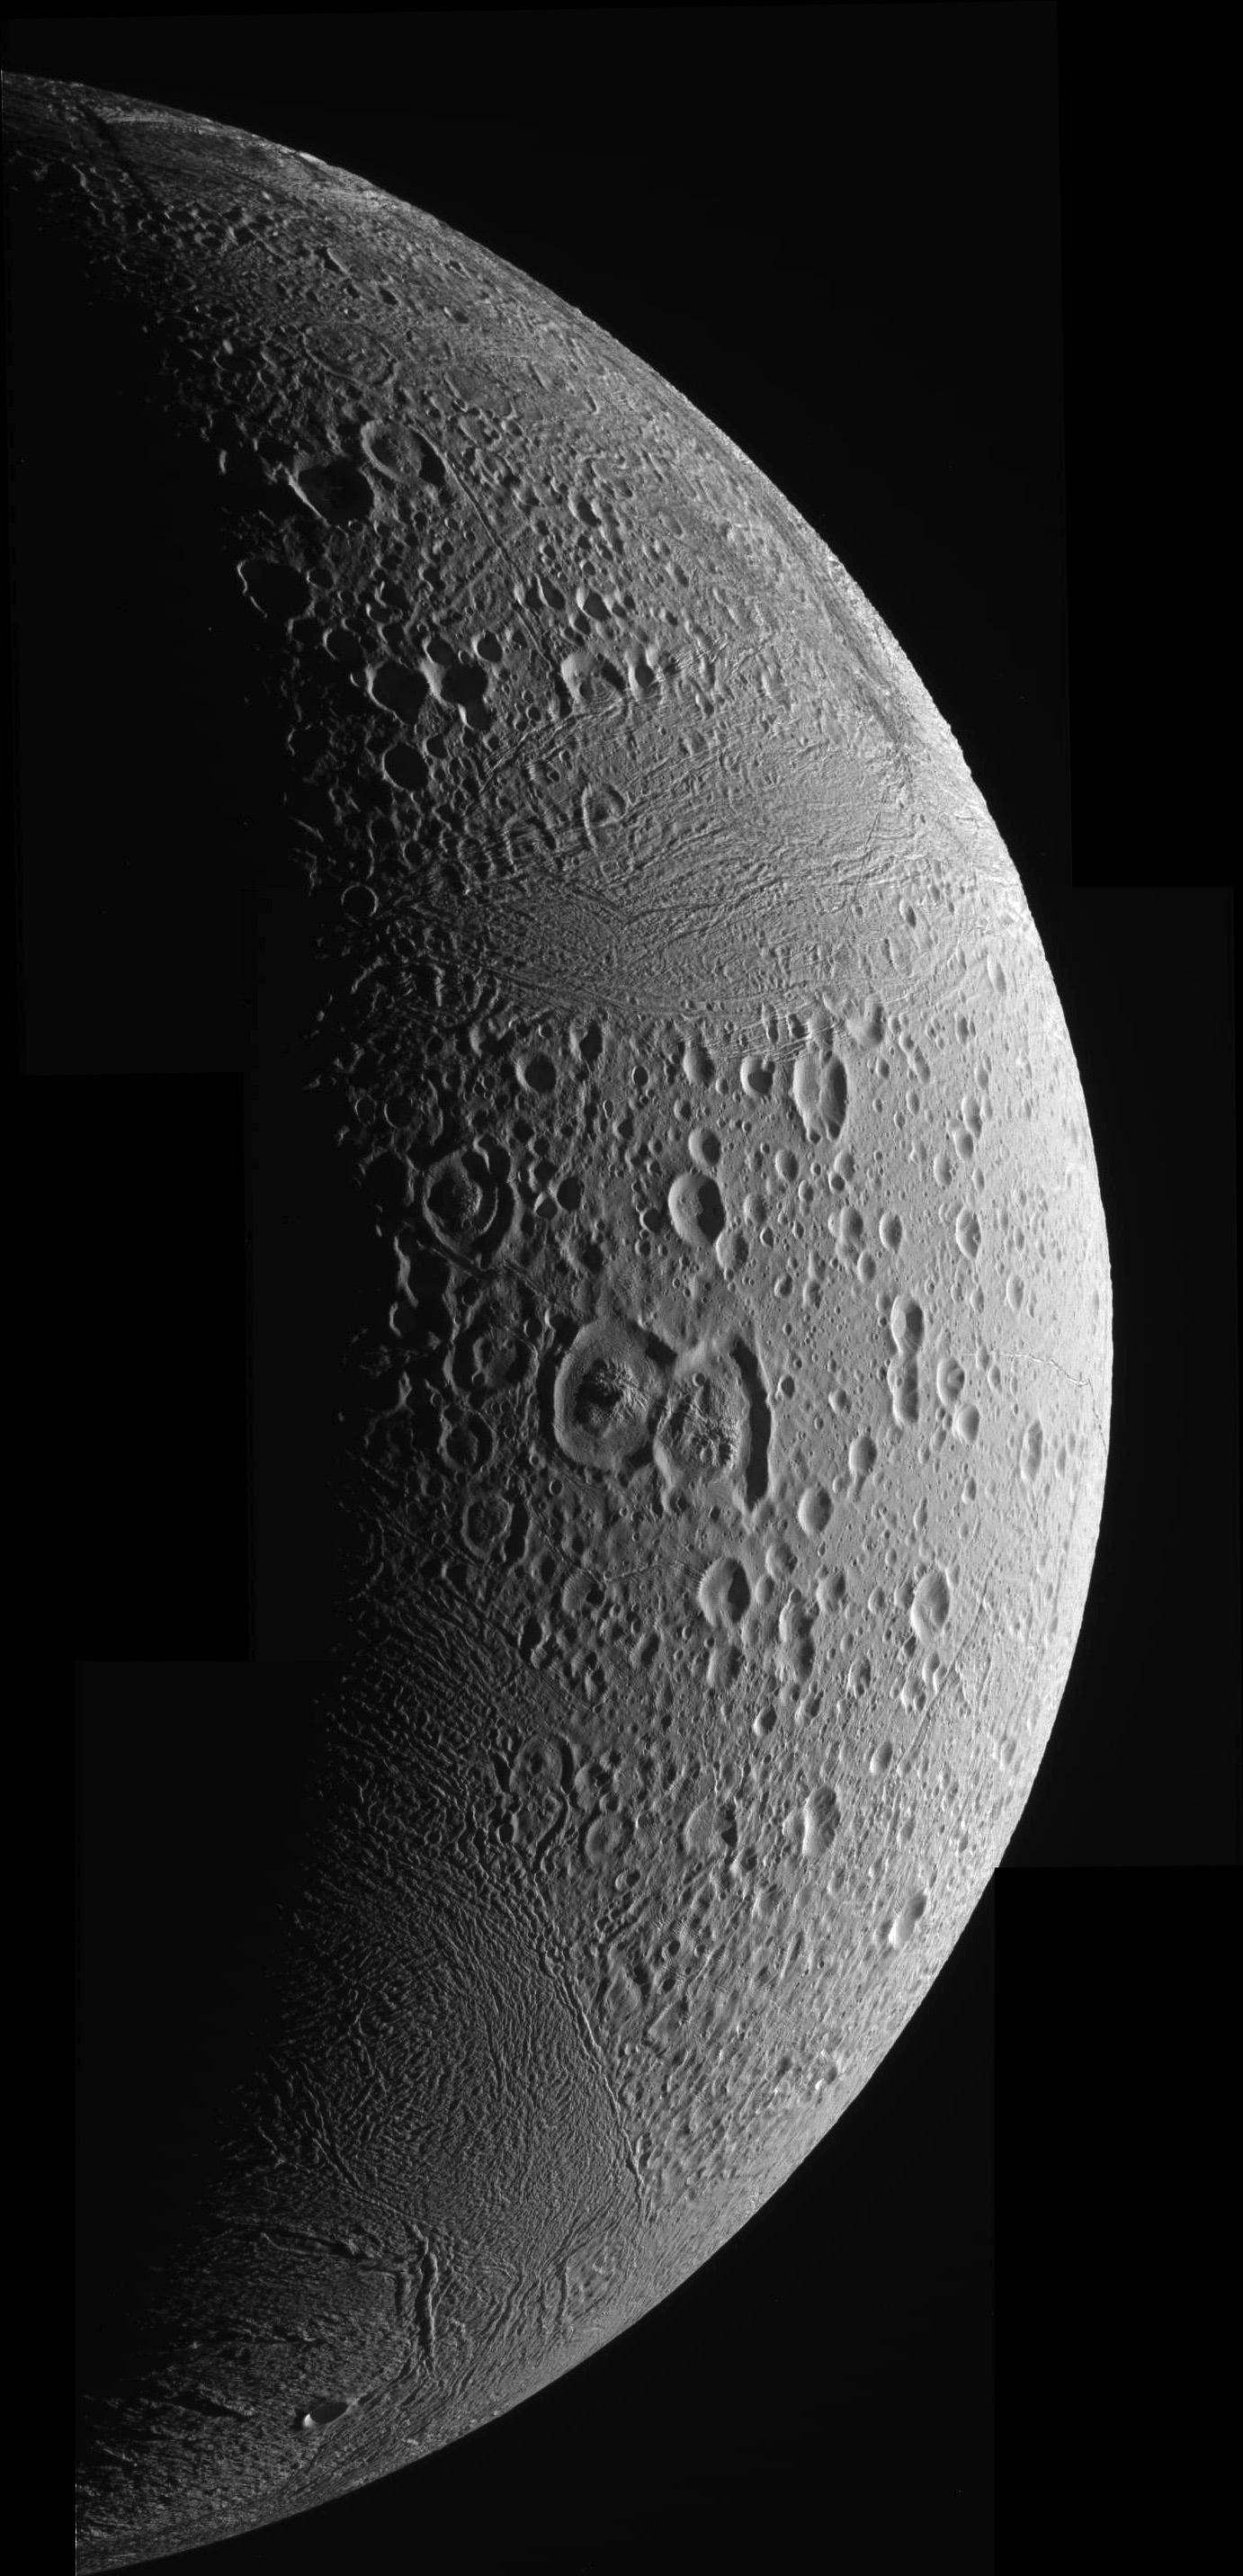 Enceladus March 12, 2008 - Mosaic #1